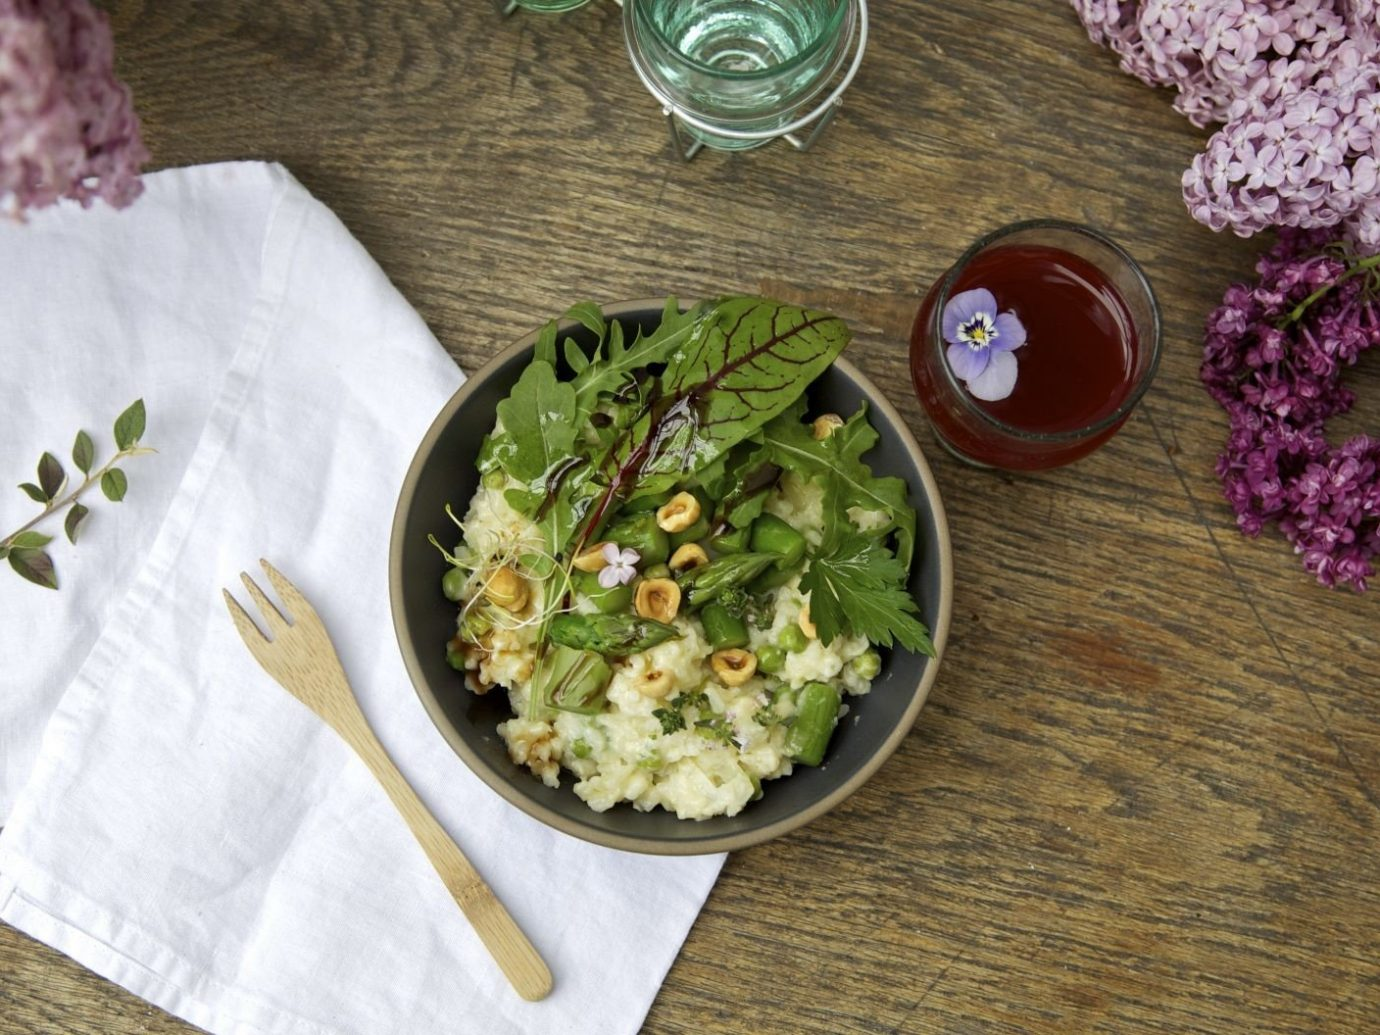 Trip Ideas table food dish floor produce cloth plant land plant vegetable meal flower cuisine flowering plant